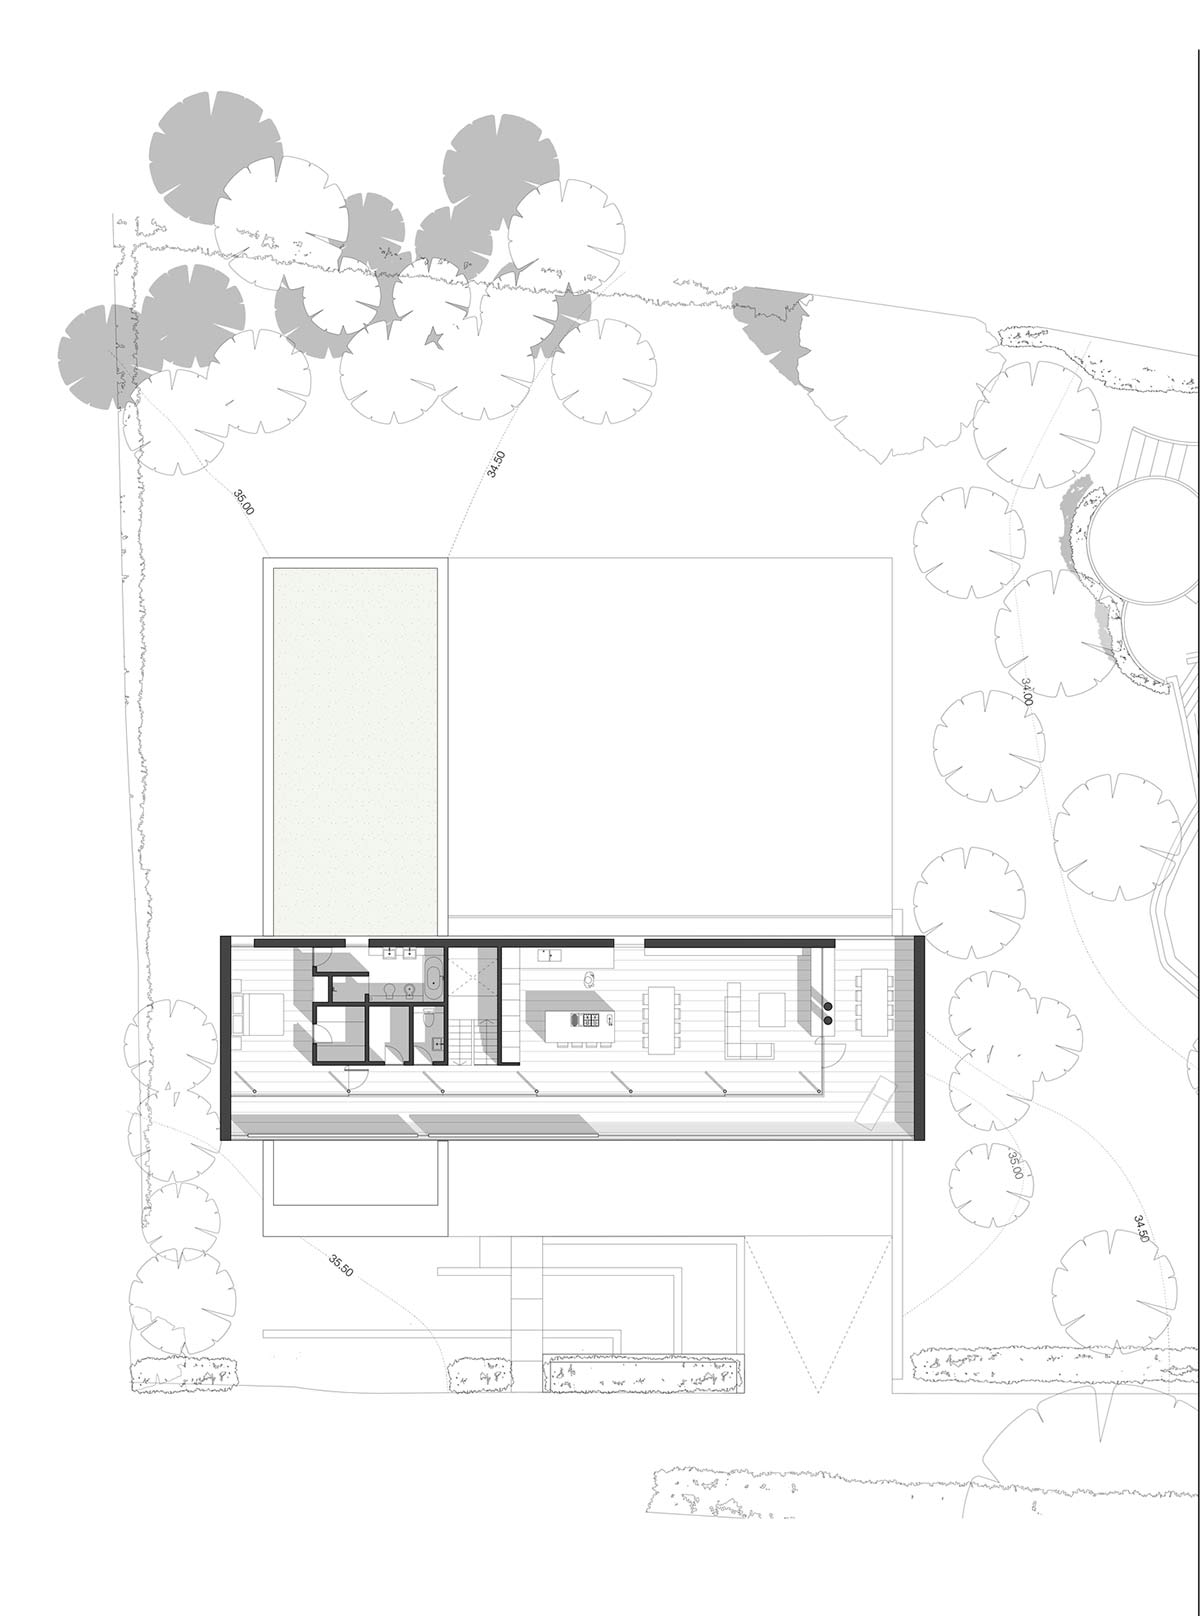 Plan hurst house buckinghamshire by john pardey architects strom